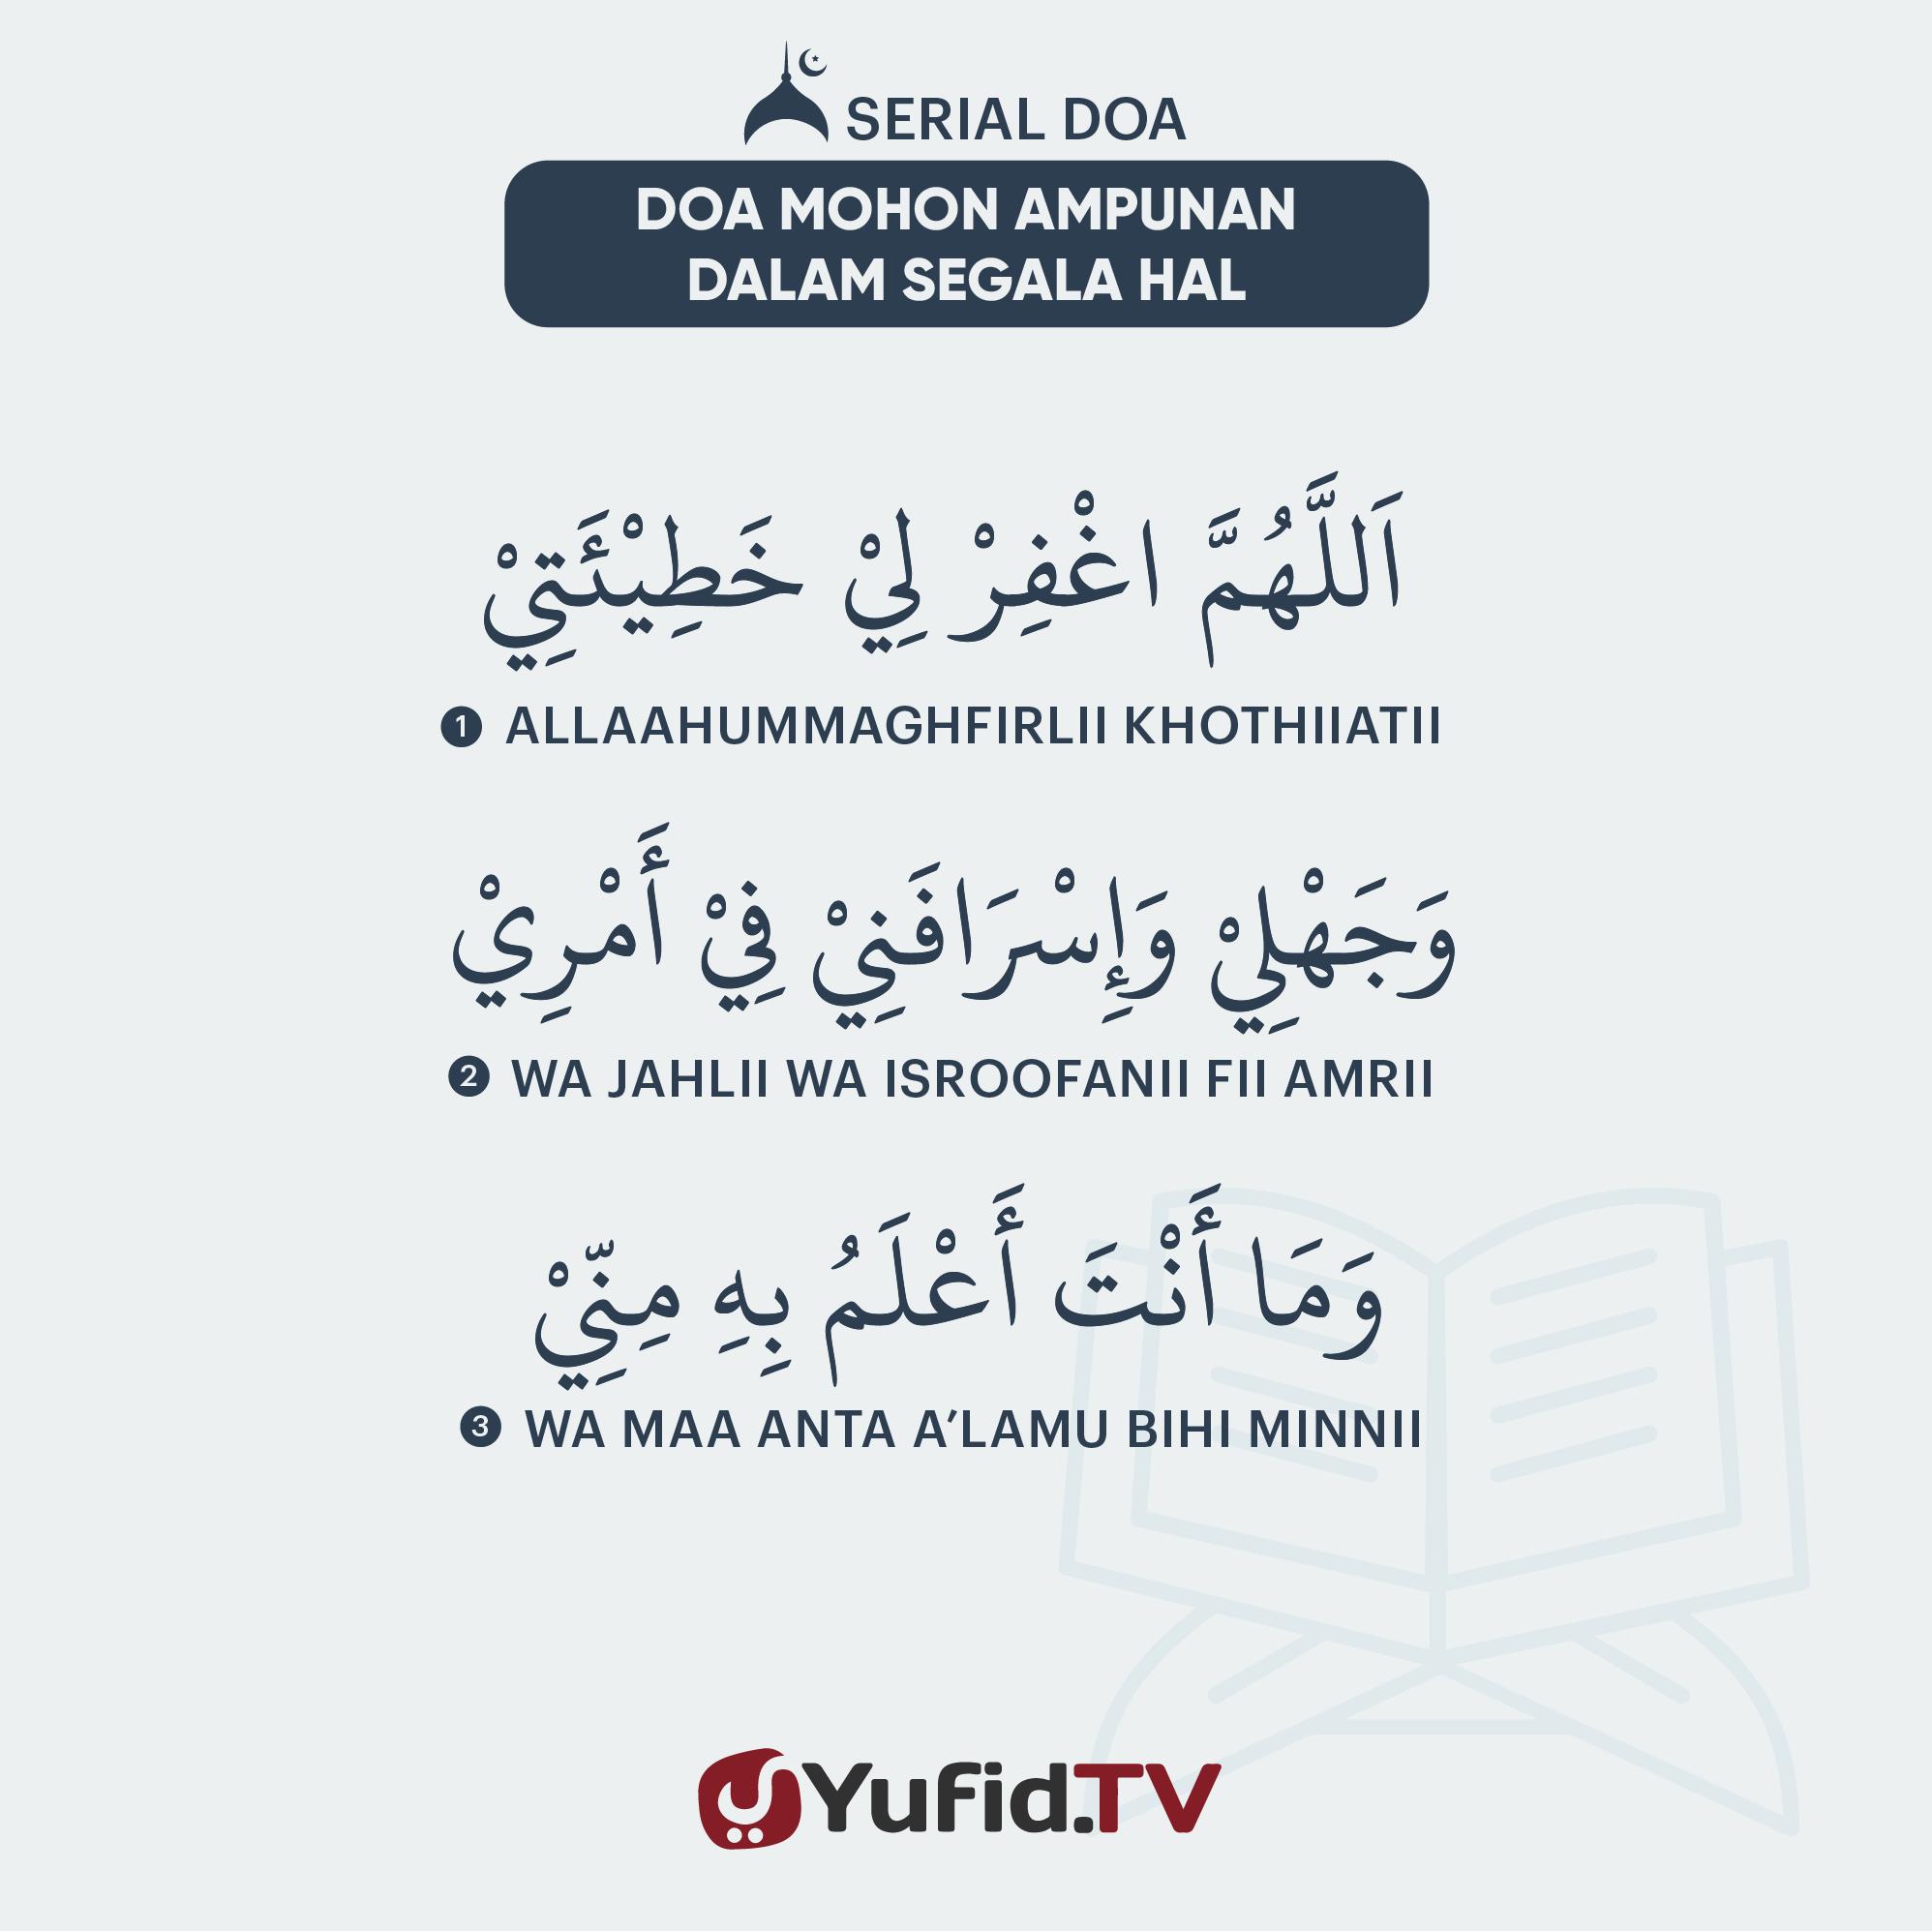 Doa Mohon Ampunan dalam Segala Hal